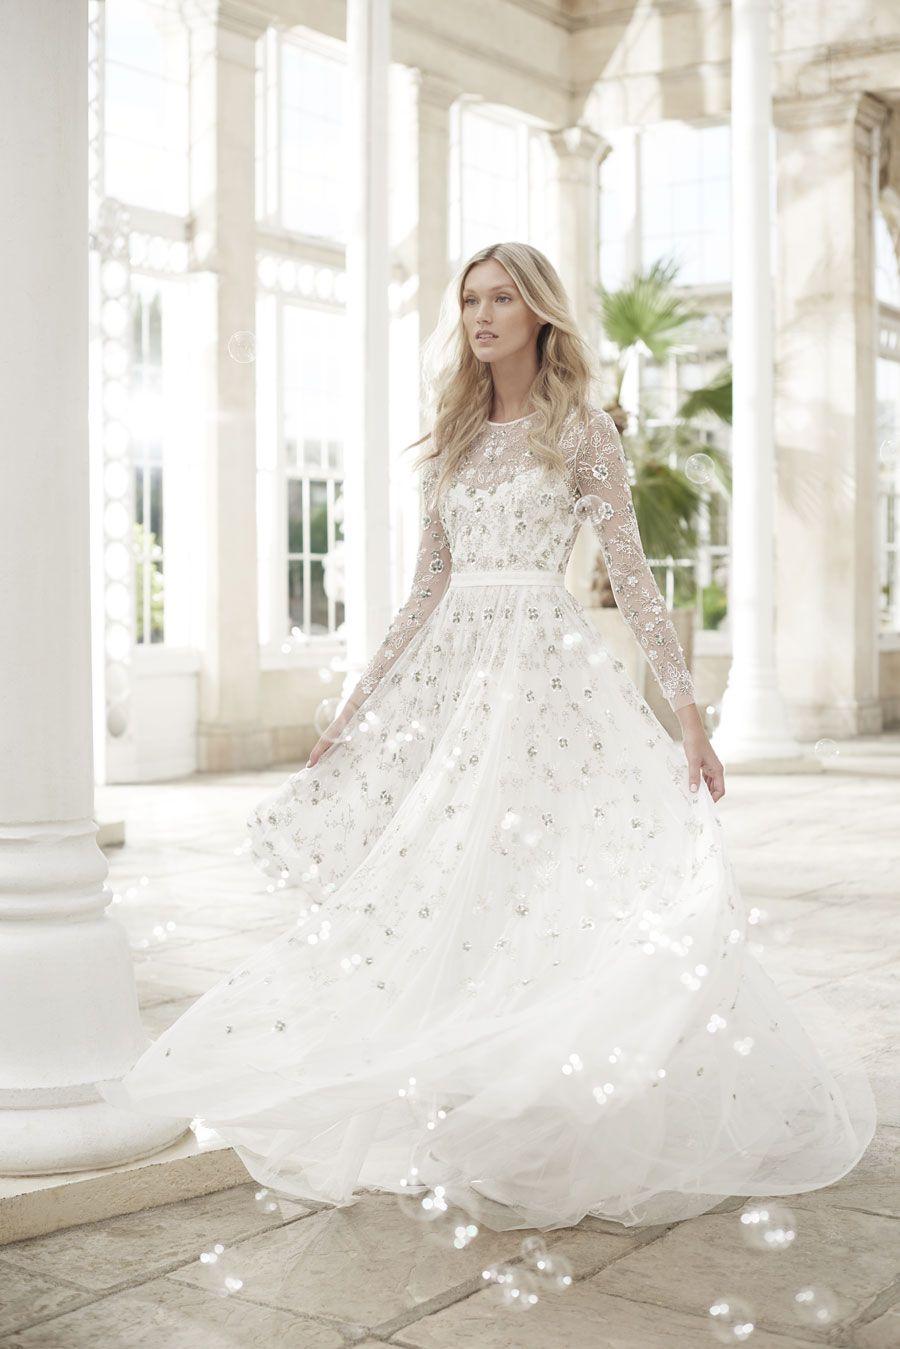 Wonderfully Romantic Wedding Dresses: The Needle & Thread Spring ...